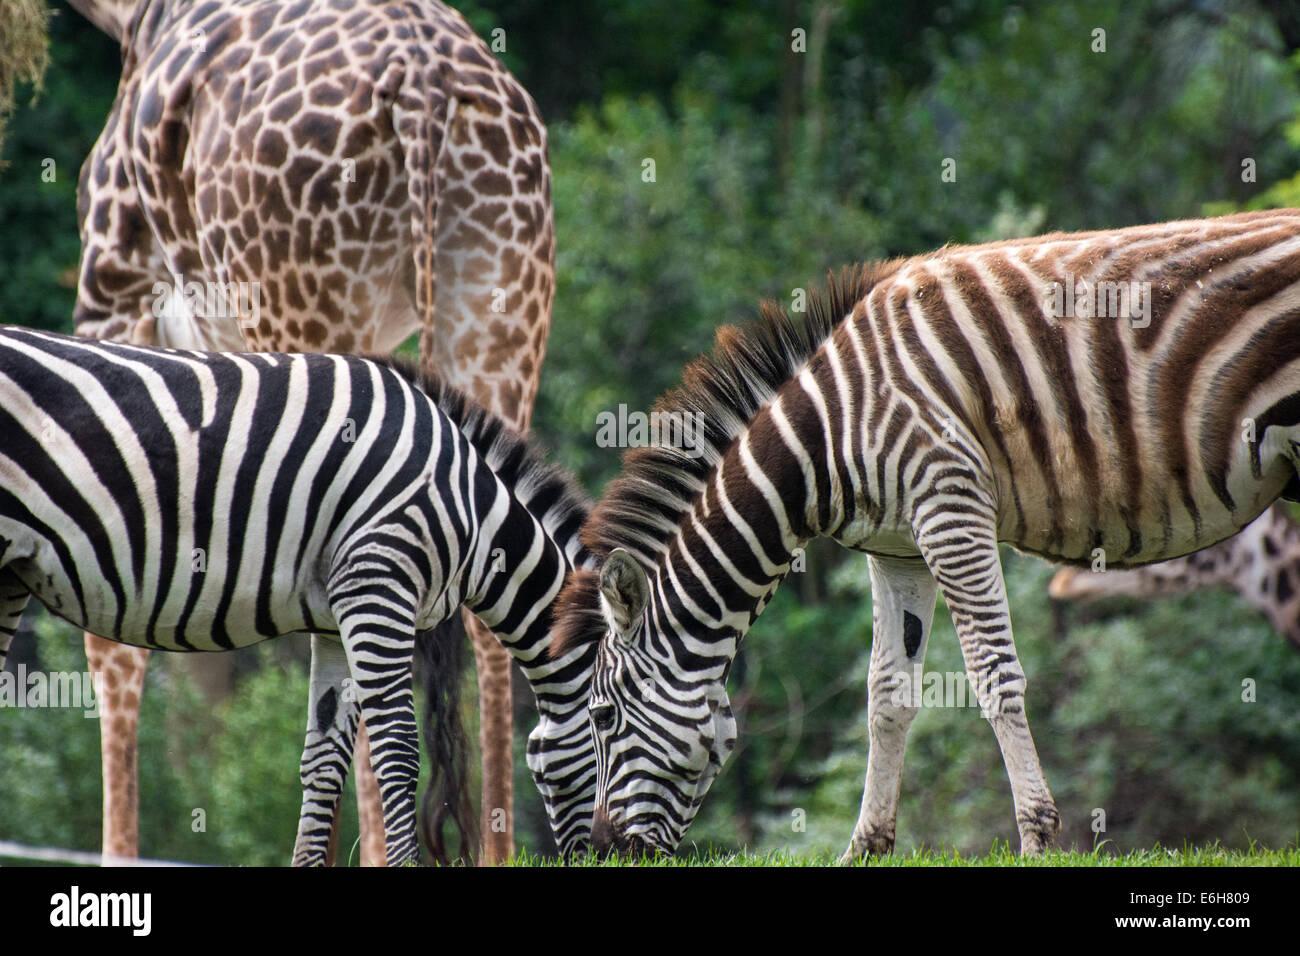 Grant S Zebra Zoo Stock Photos Amp Grant S Zebra Zoo Stock